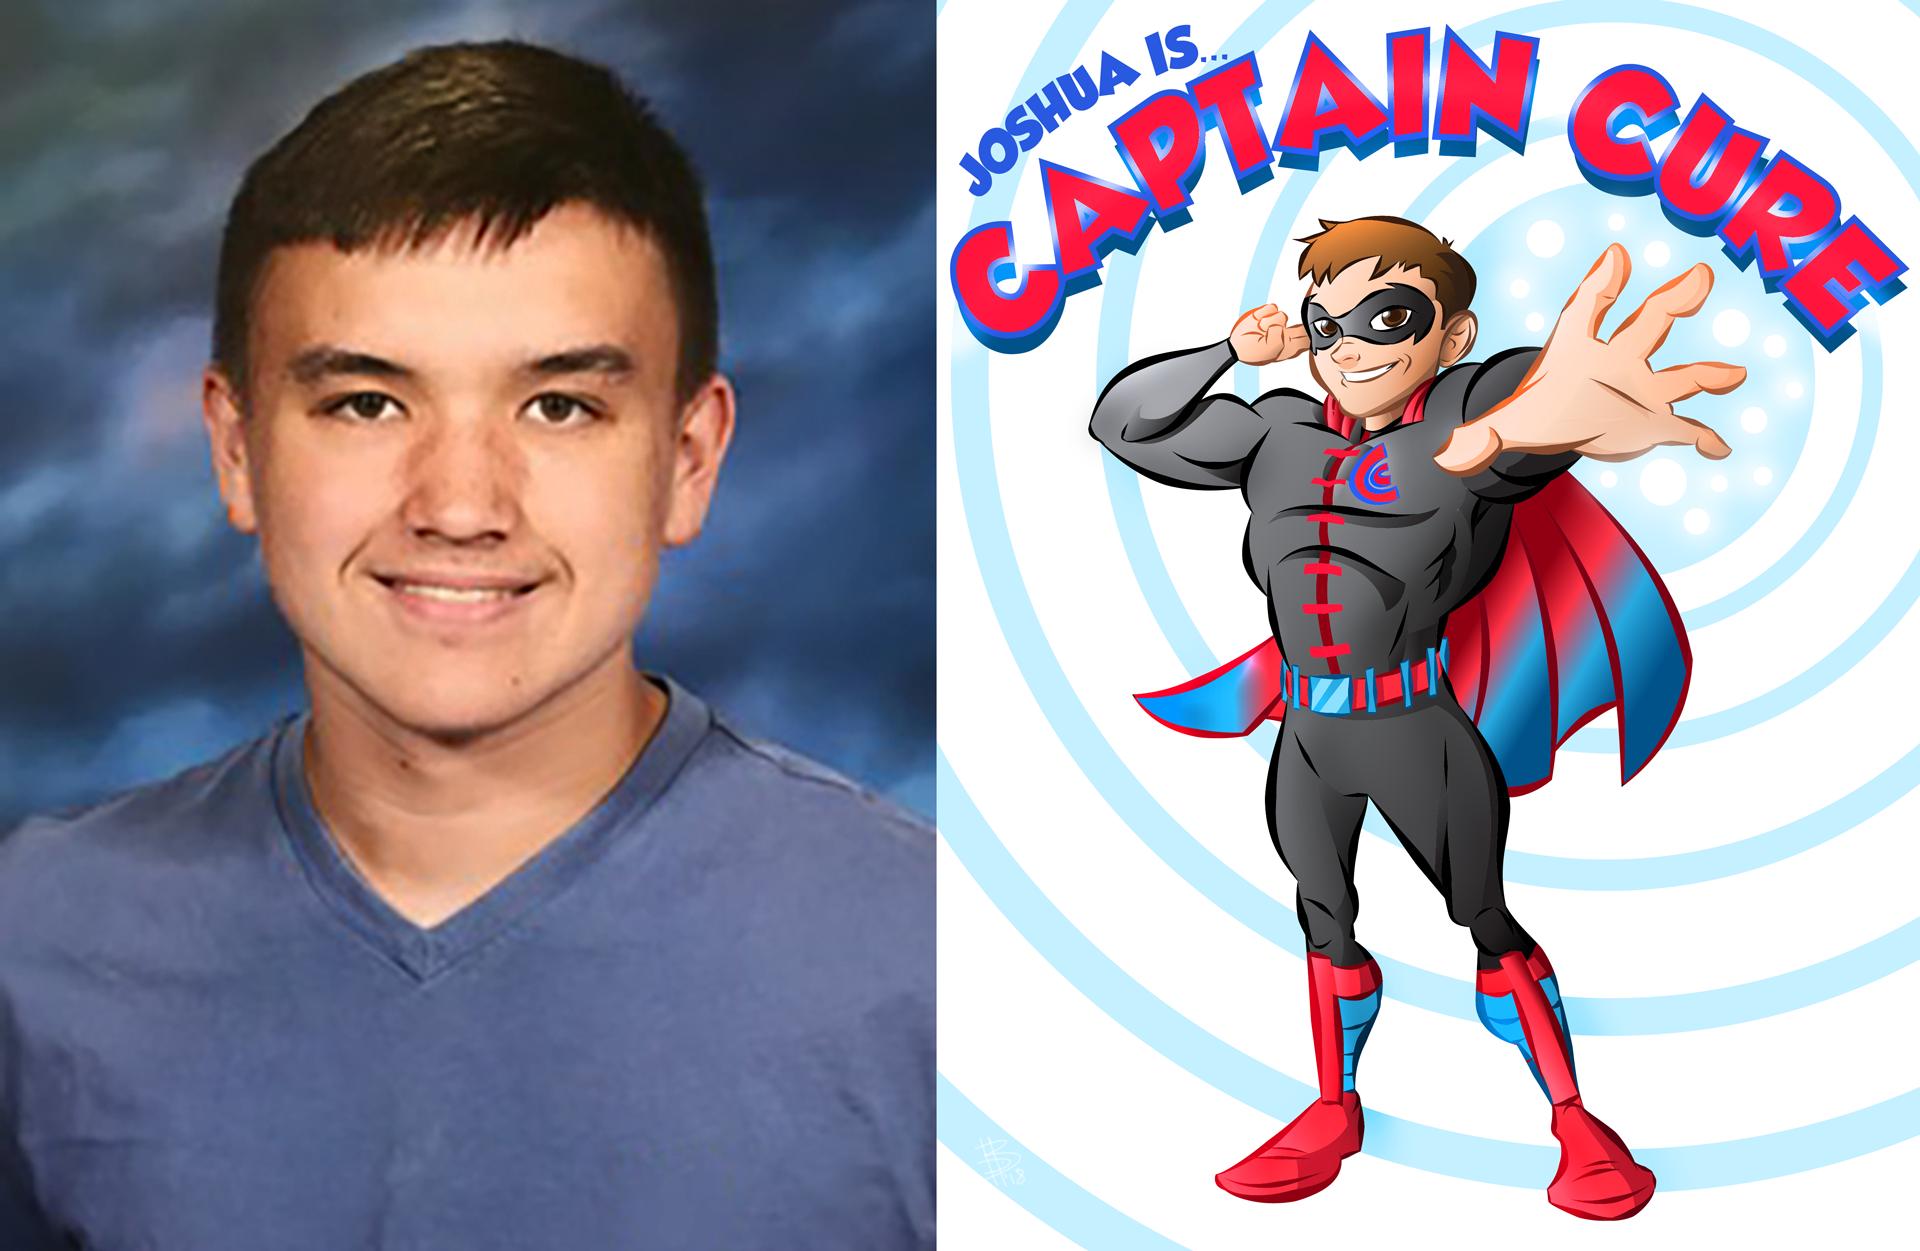 Joshua (Captain Cure)